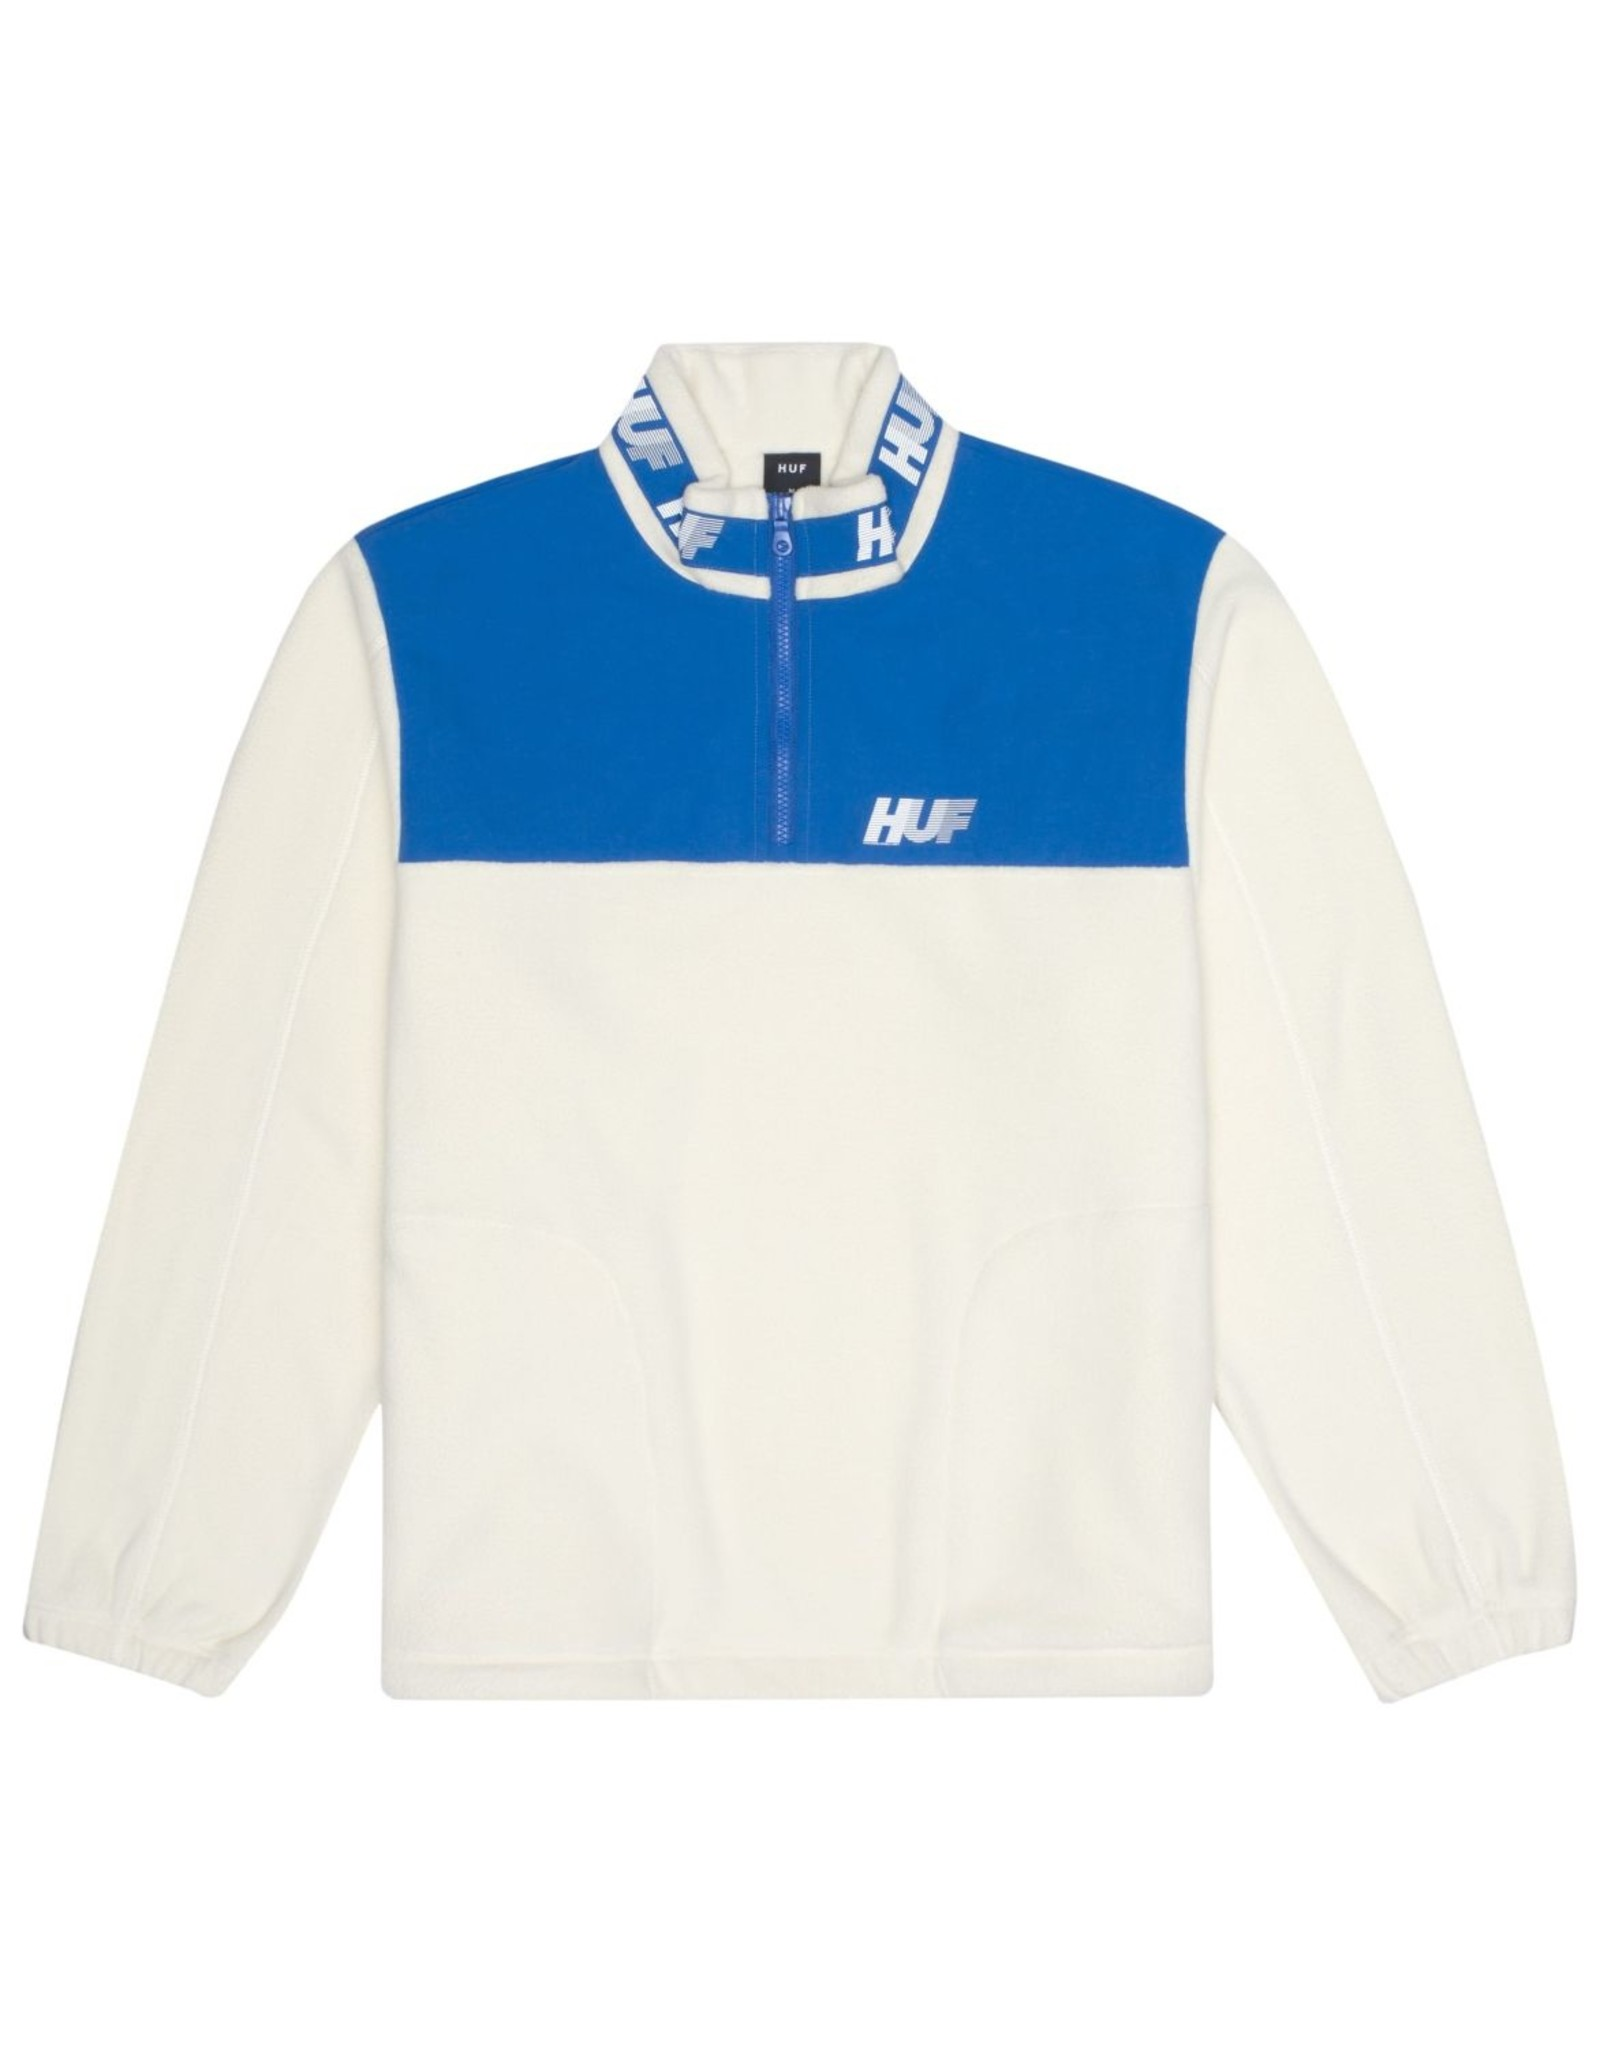 HUF HUF - MOUNTAIN 10K 1/4 ZIP - White/blue